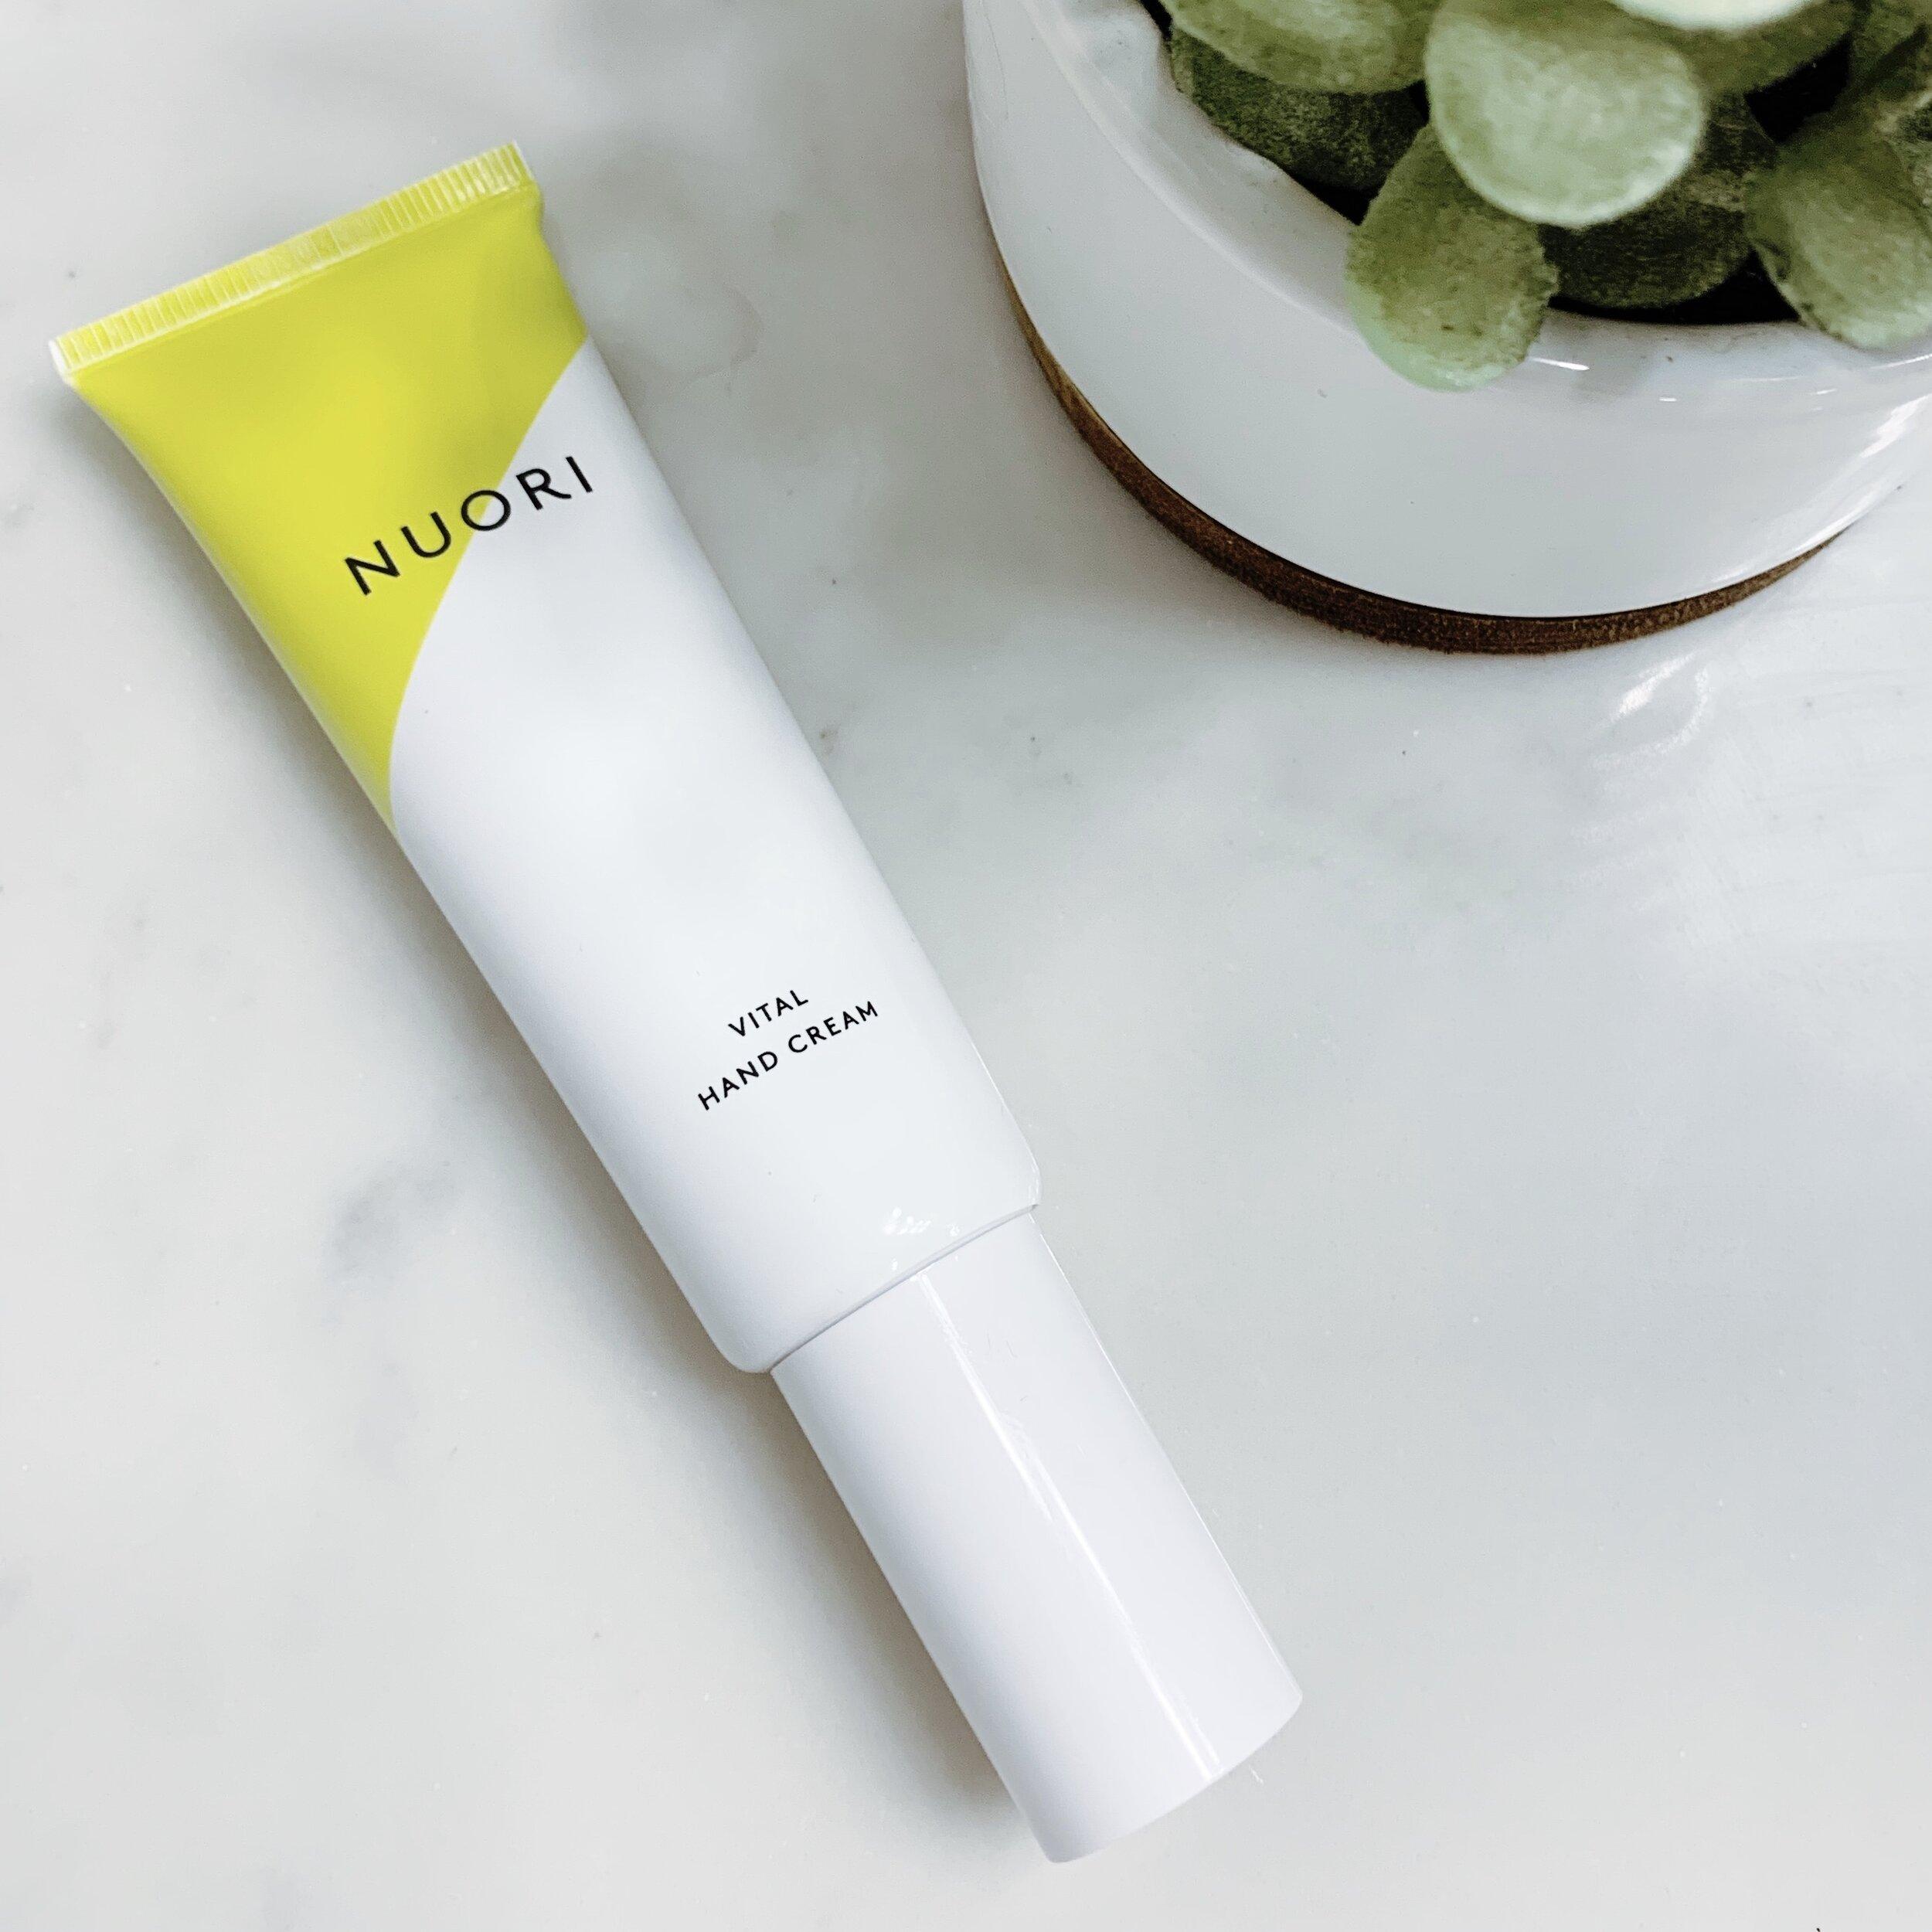 Nuori Vital Hand Cream - $45